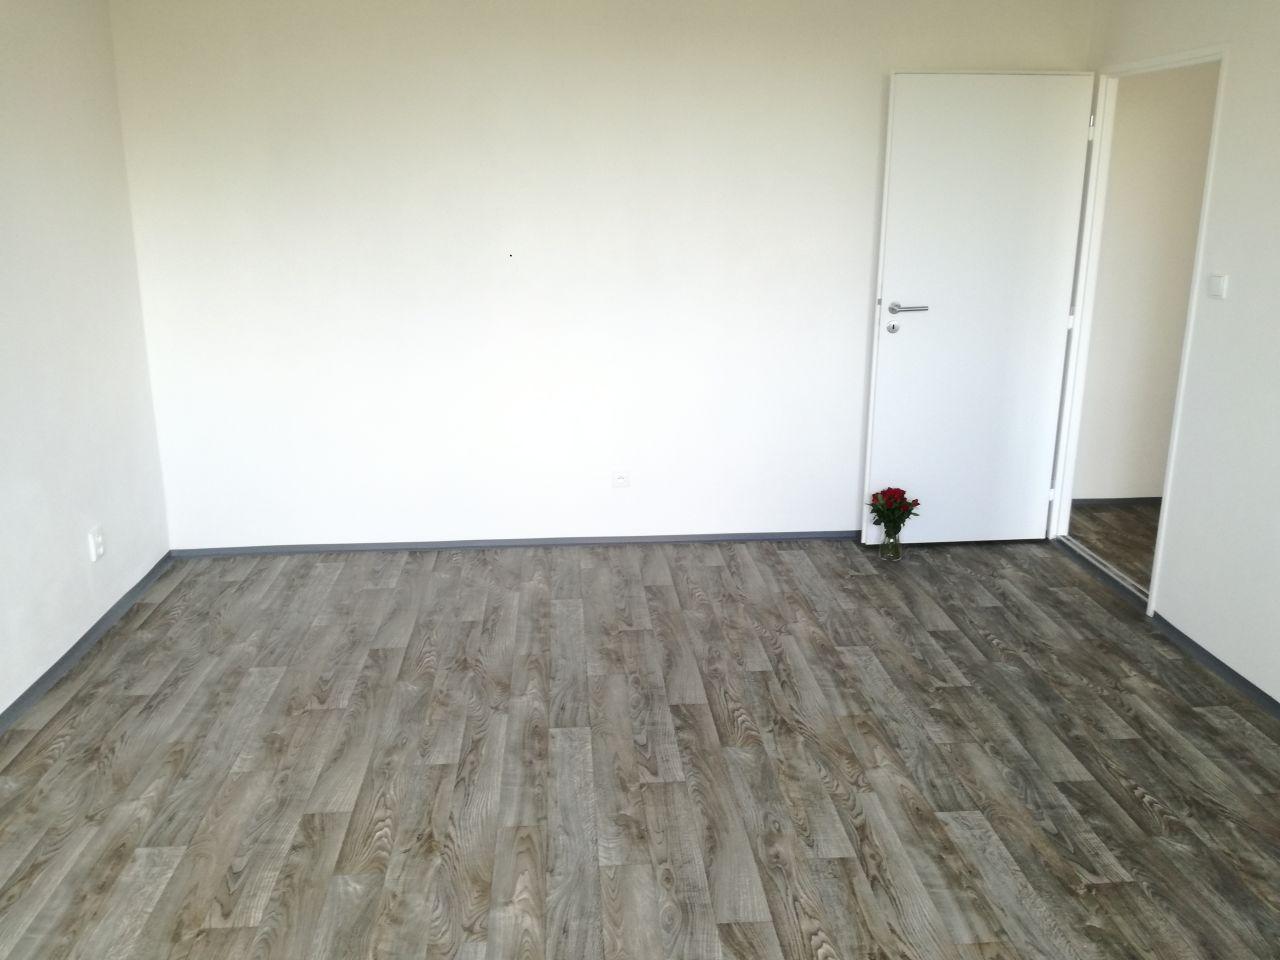 Pronájem bytu 2+1 55 m2, ul. Marie Majerové 1698/13, Ostrava - Poruba